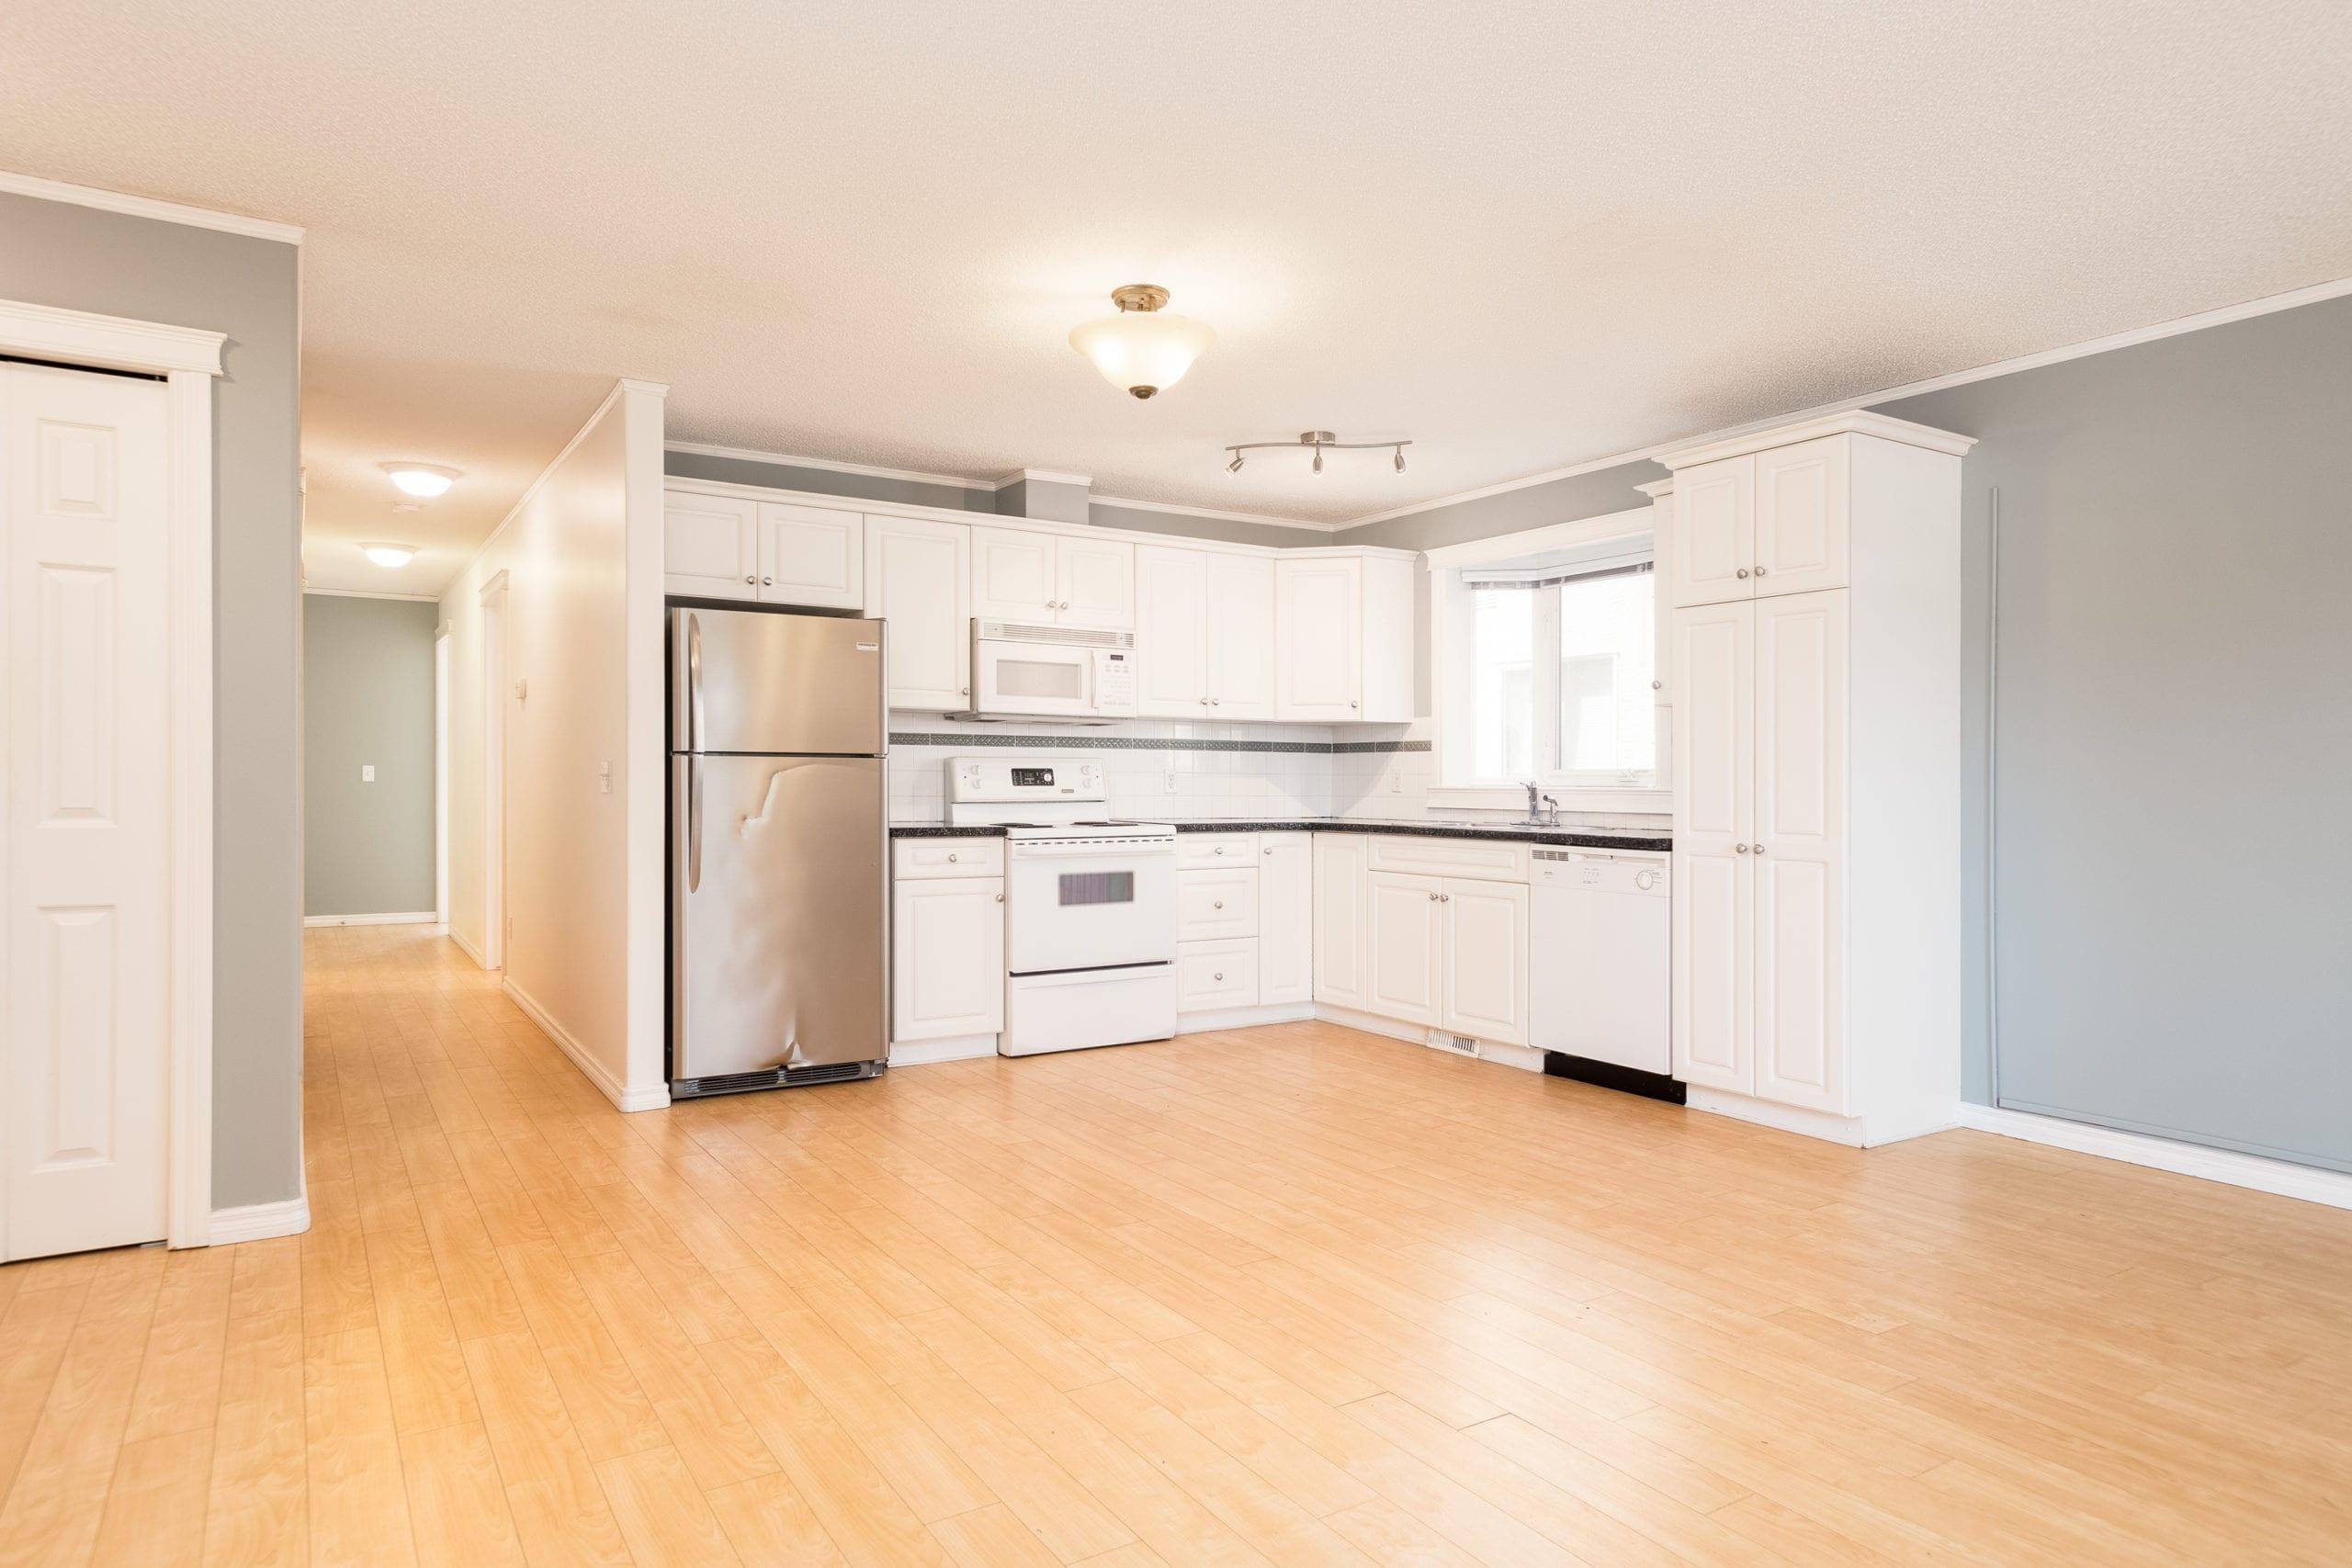 Hello Gorgeous - 201-339 30 Ave NE, Calgary AB - Tara Molina Real Estate